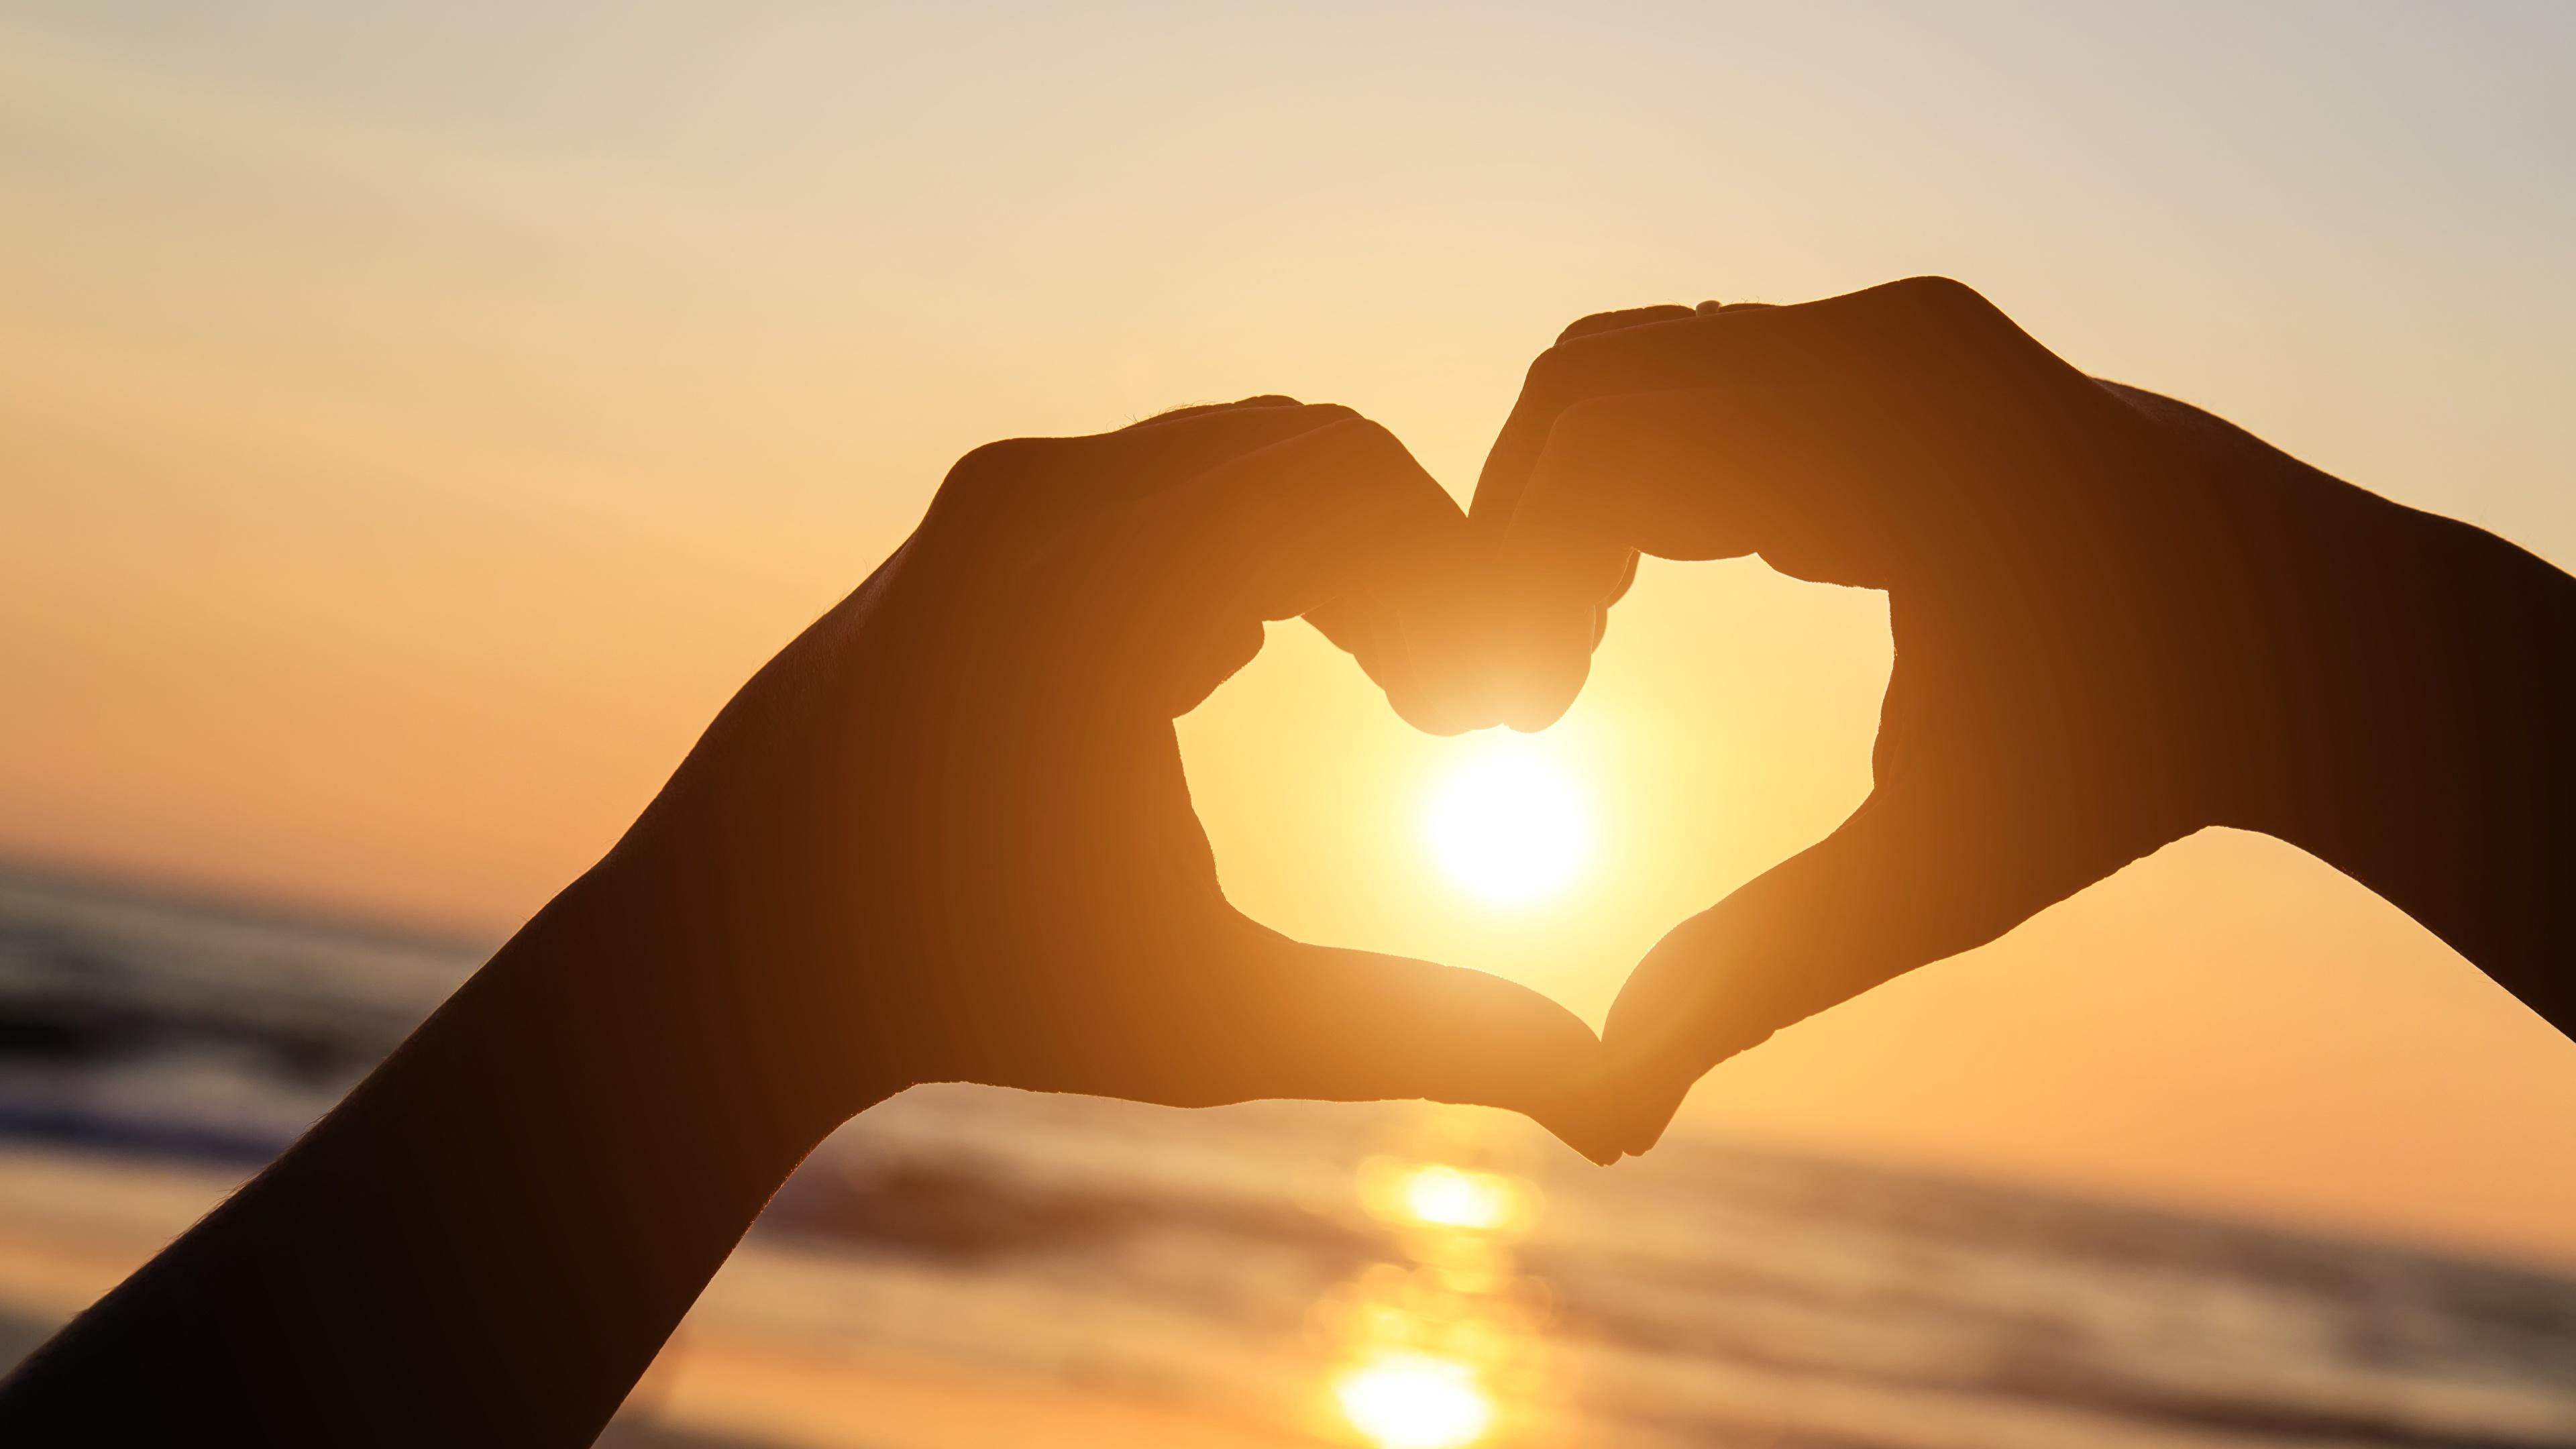 Фото сердечко силуэты солнца Природа Руки 3840x2160 серце сердца Сердце Силуэт силуэта Солнце рука